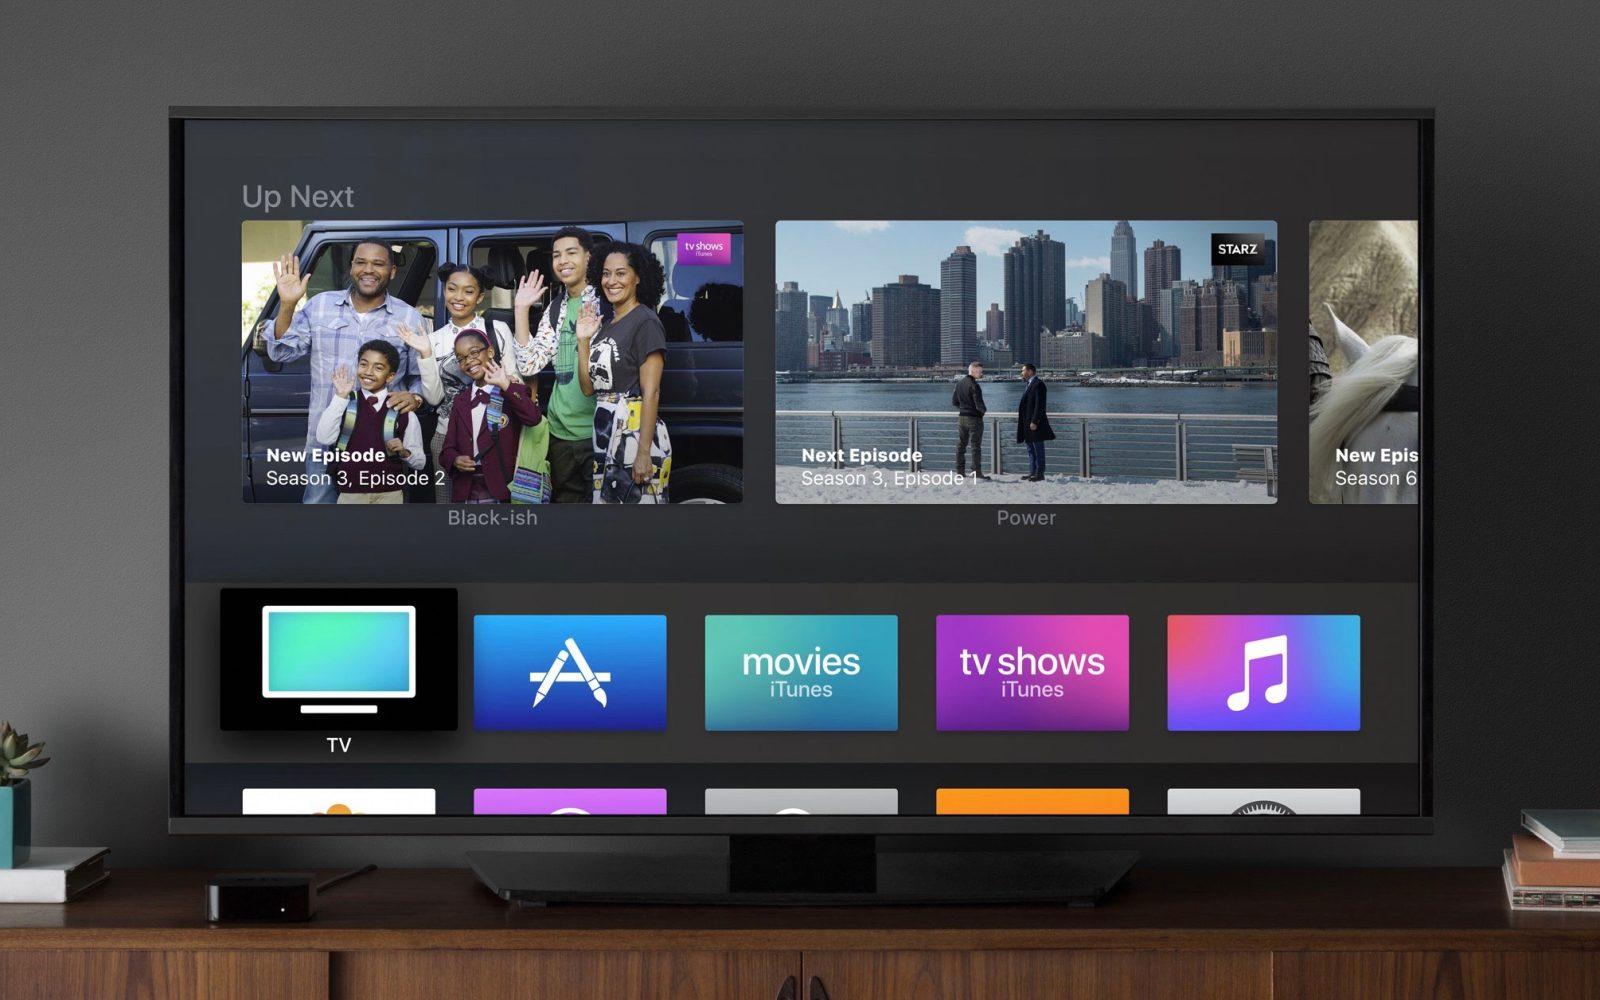 hulu app not working on samsung tv